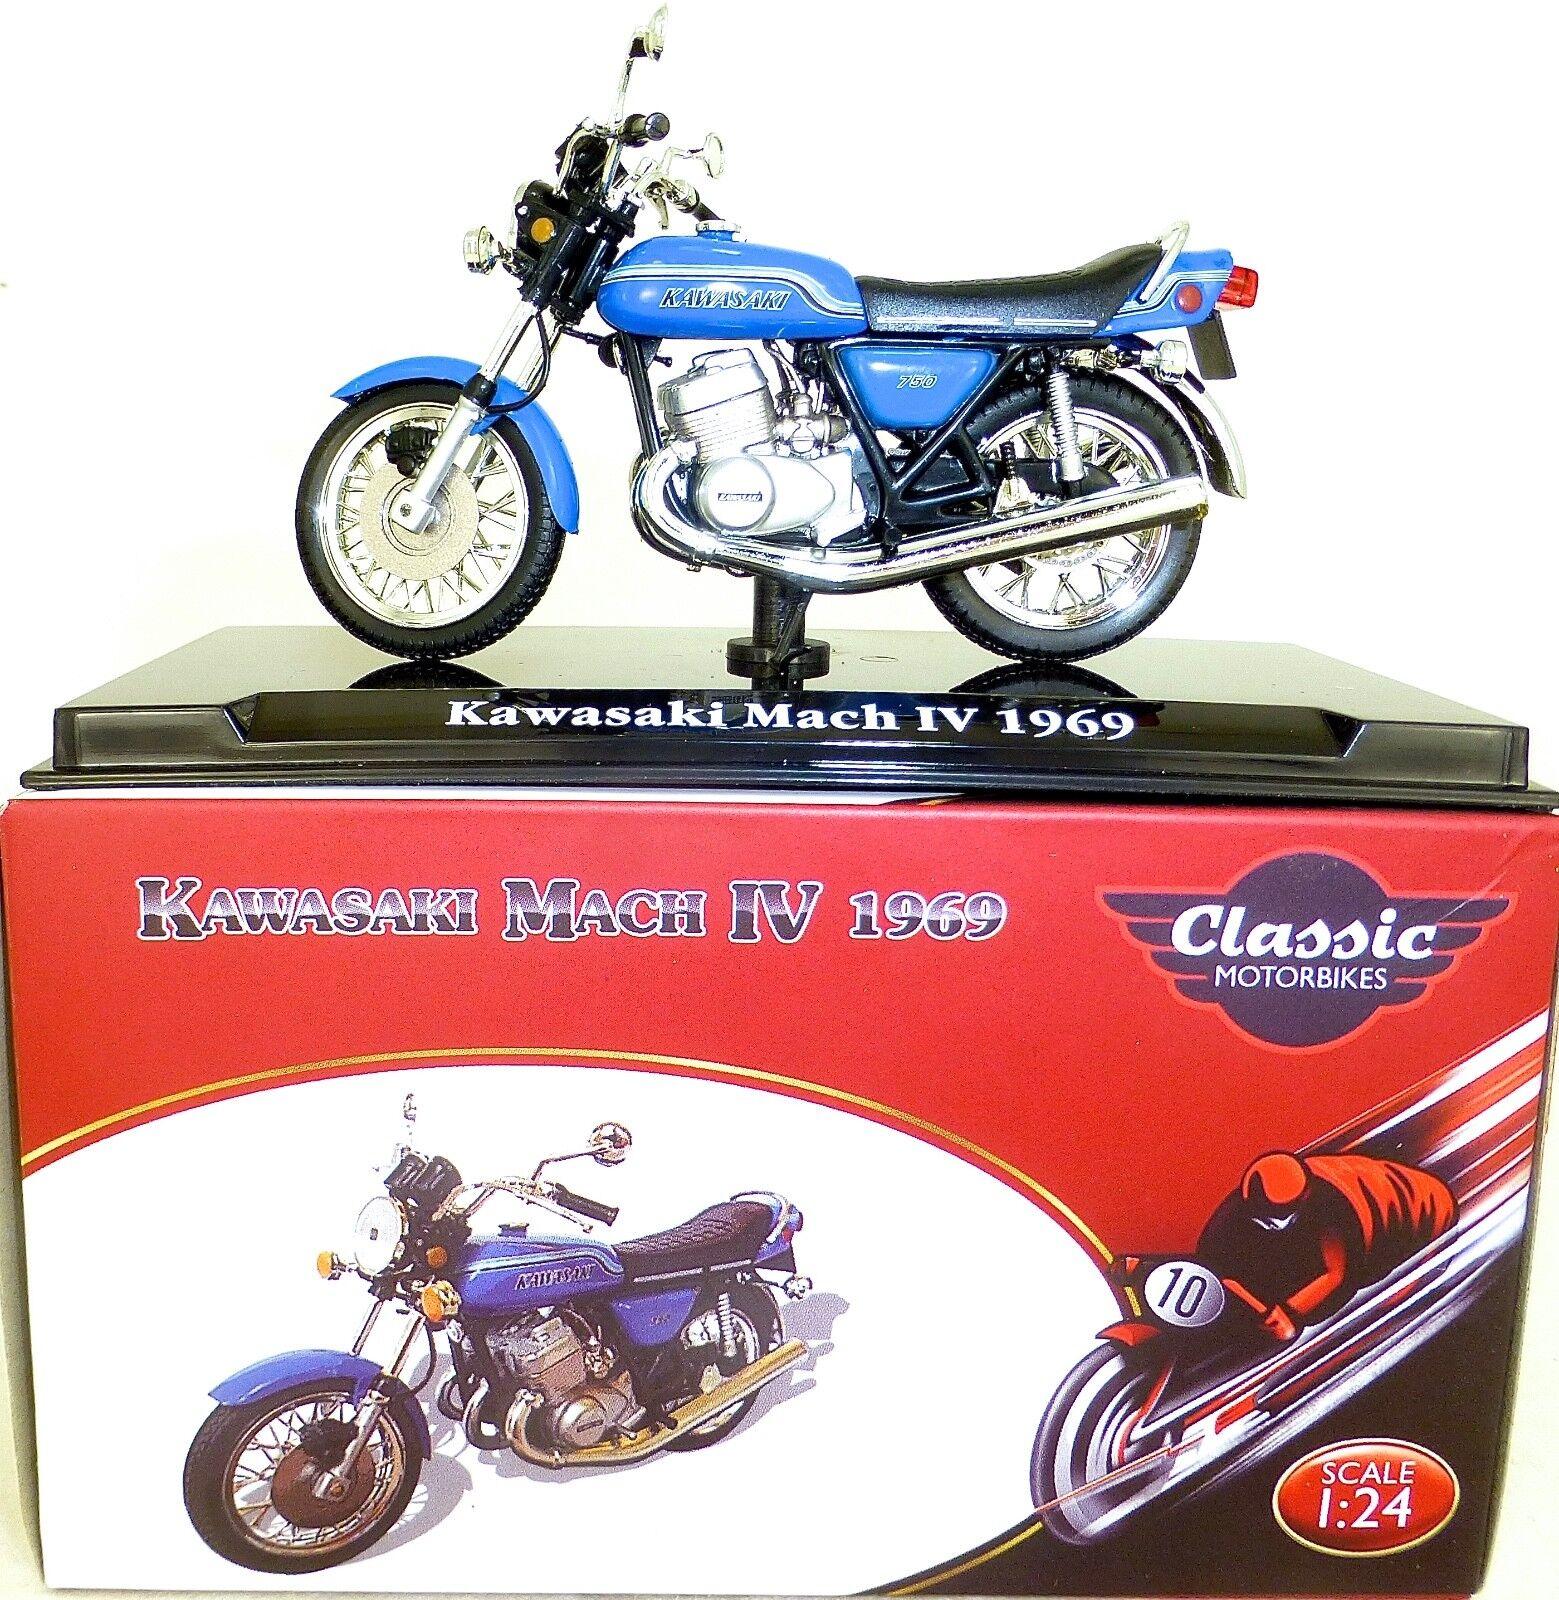 Kawasaki Do IV 1969 Moto Classique Atlas 4658111 1 24 HI3 µ